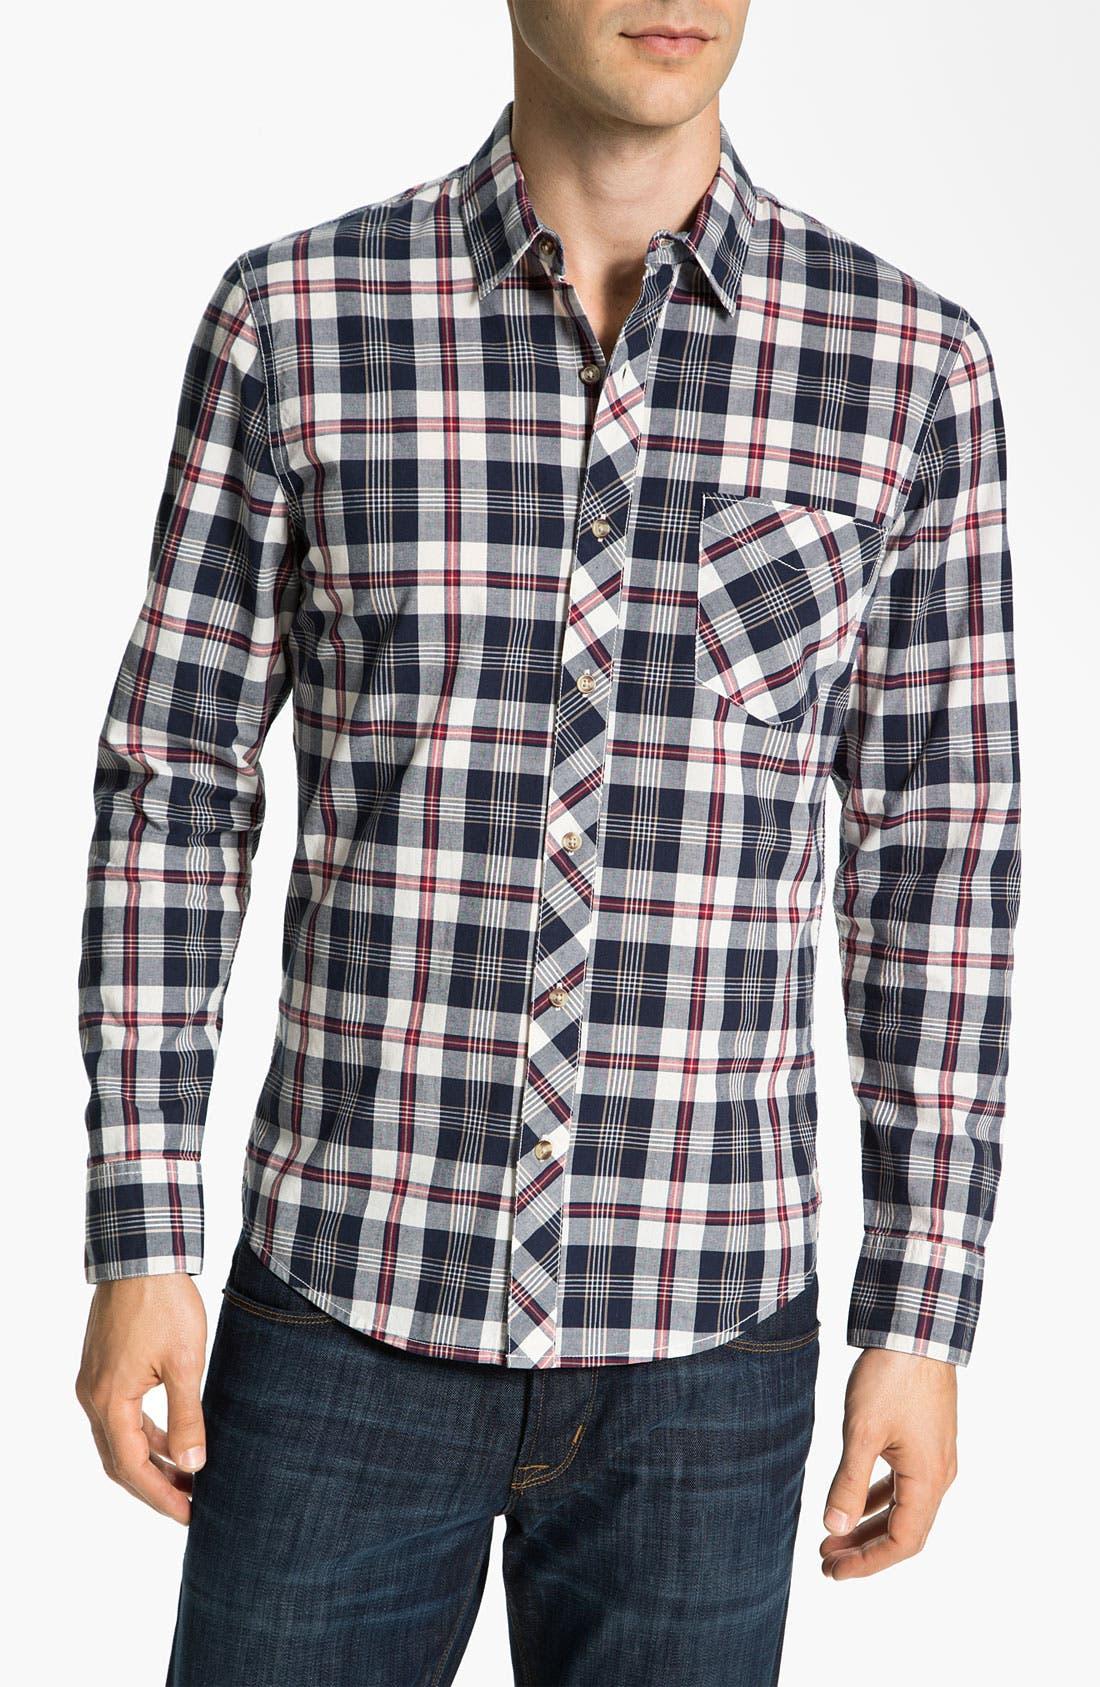 Main Image - 1901 Plaid Cotton Poplin Shirt